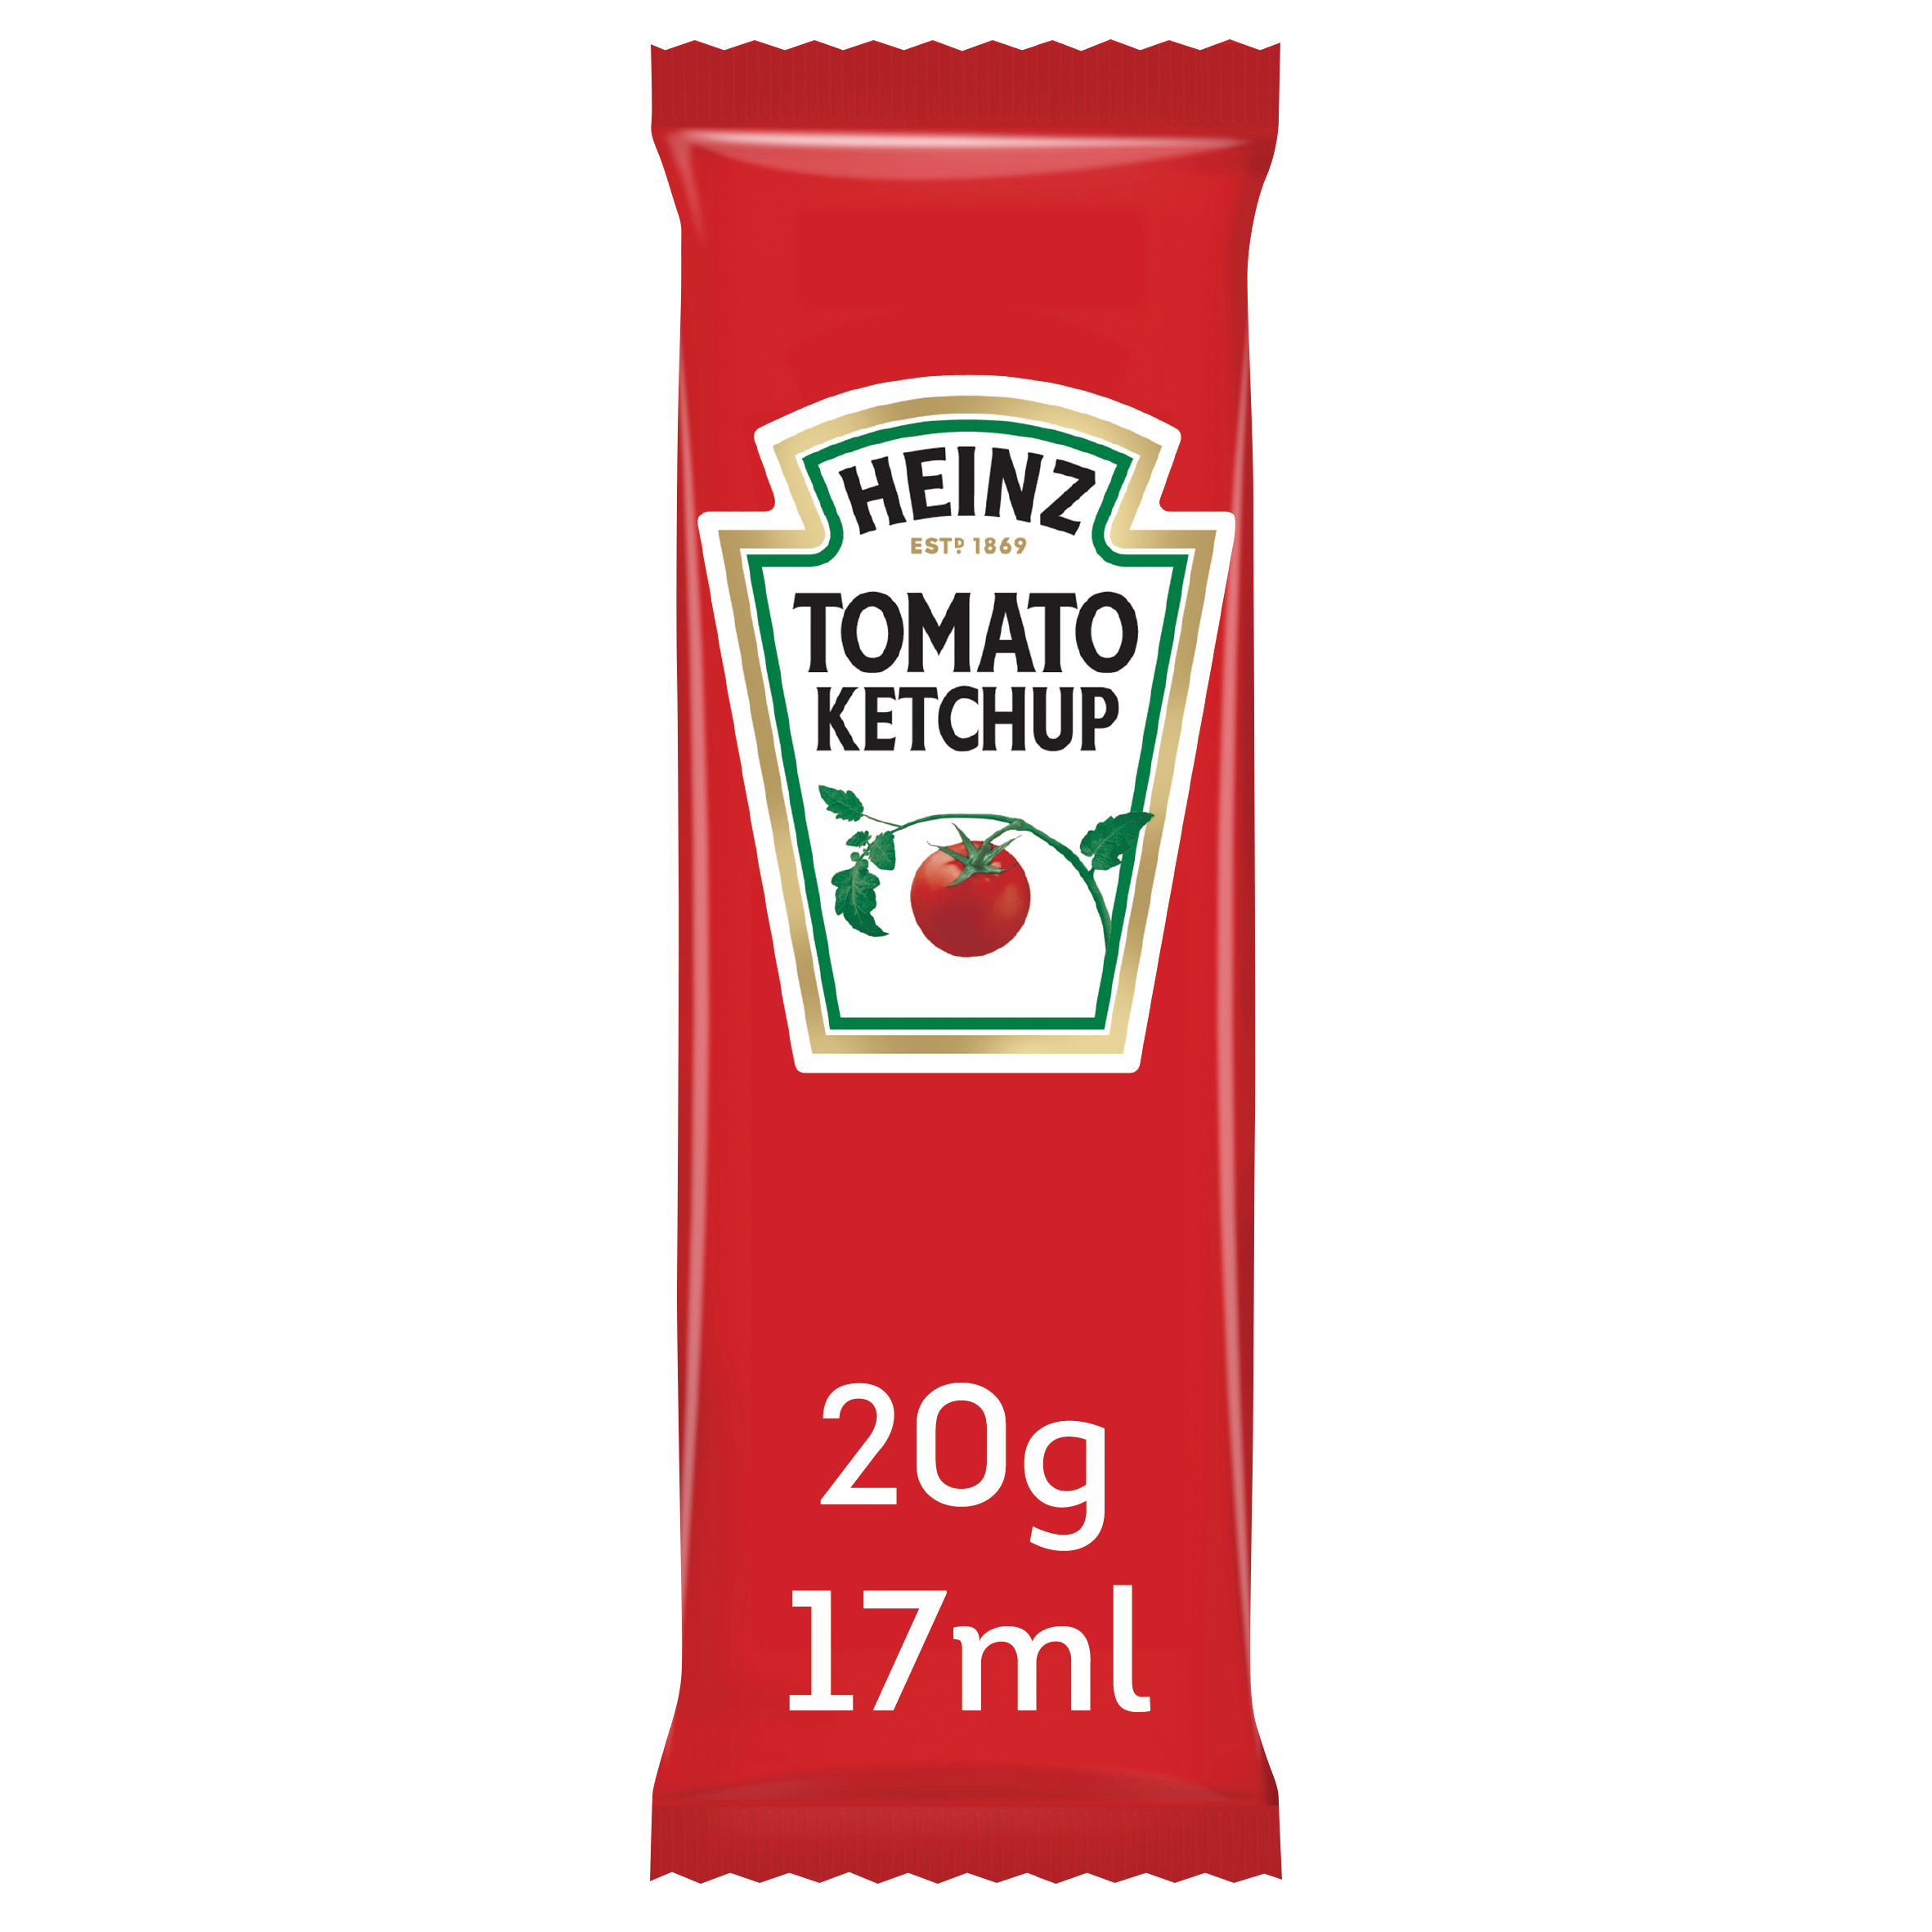 Heinz Tomato Ketchup 17ml Sachet